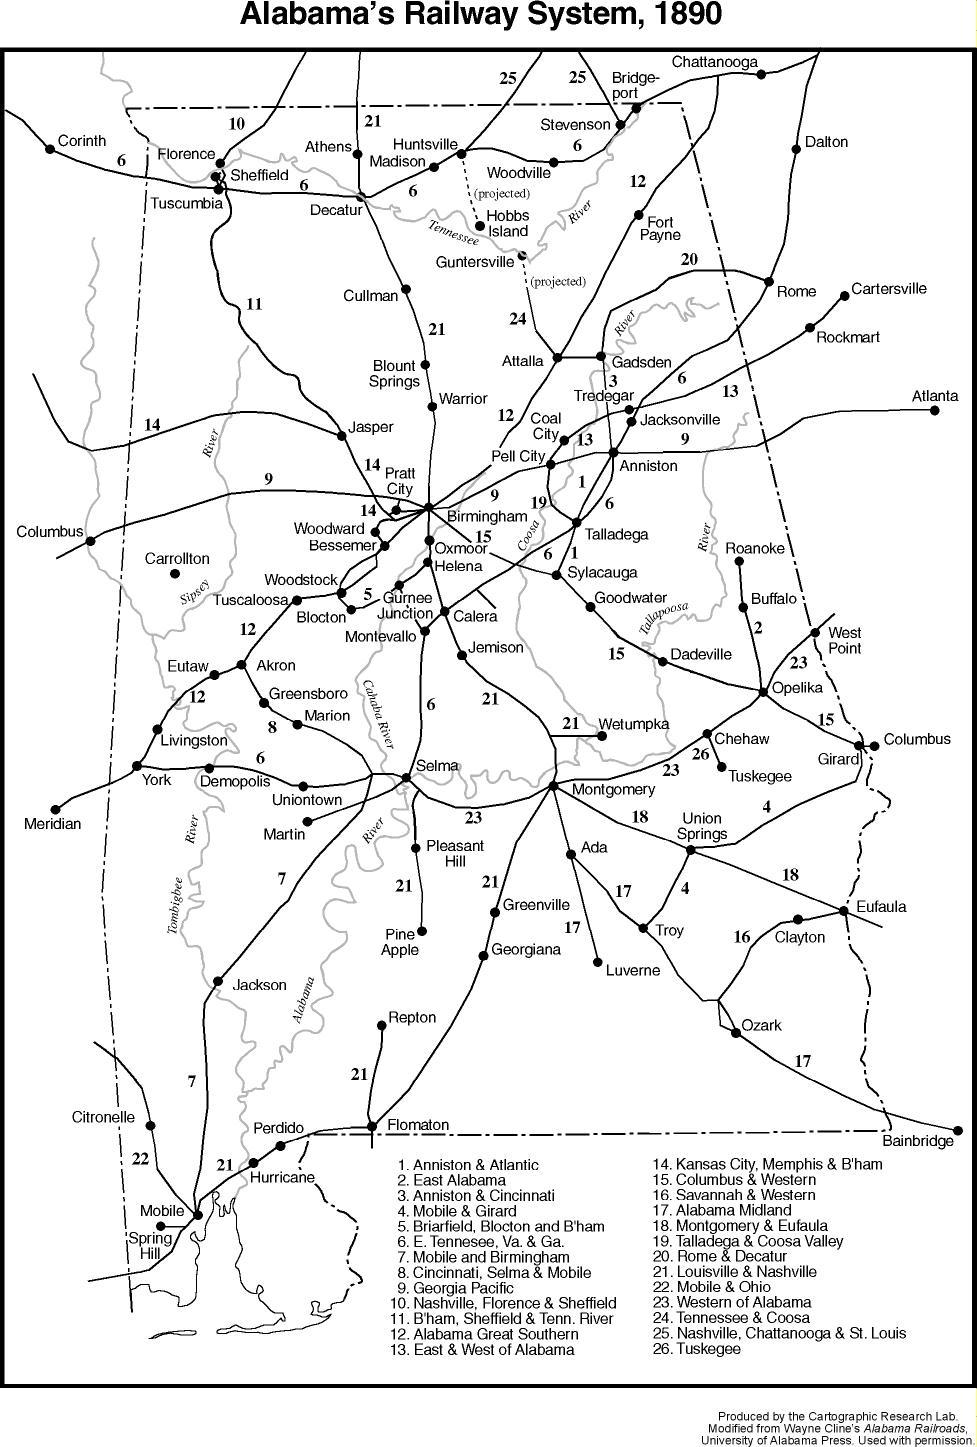 Alabama tallapoosa county - Jpeg 229kb Alabama S